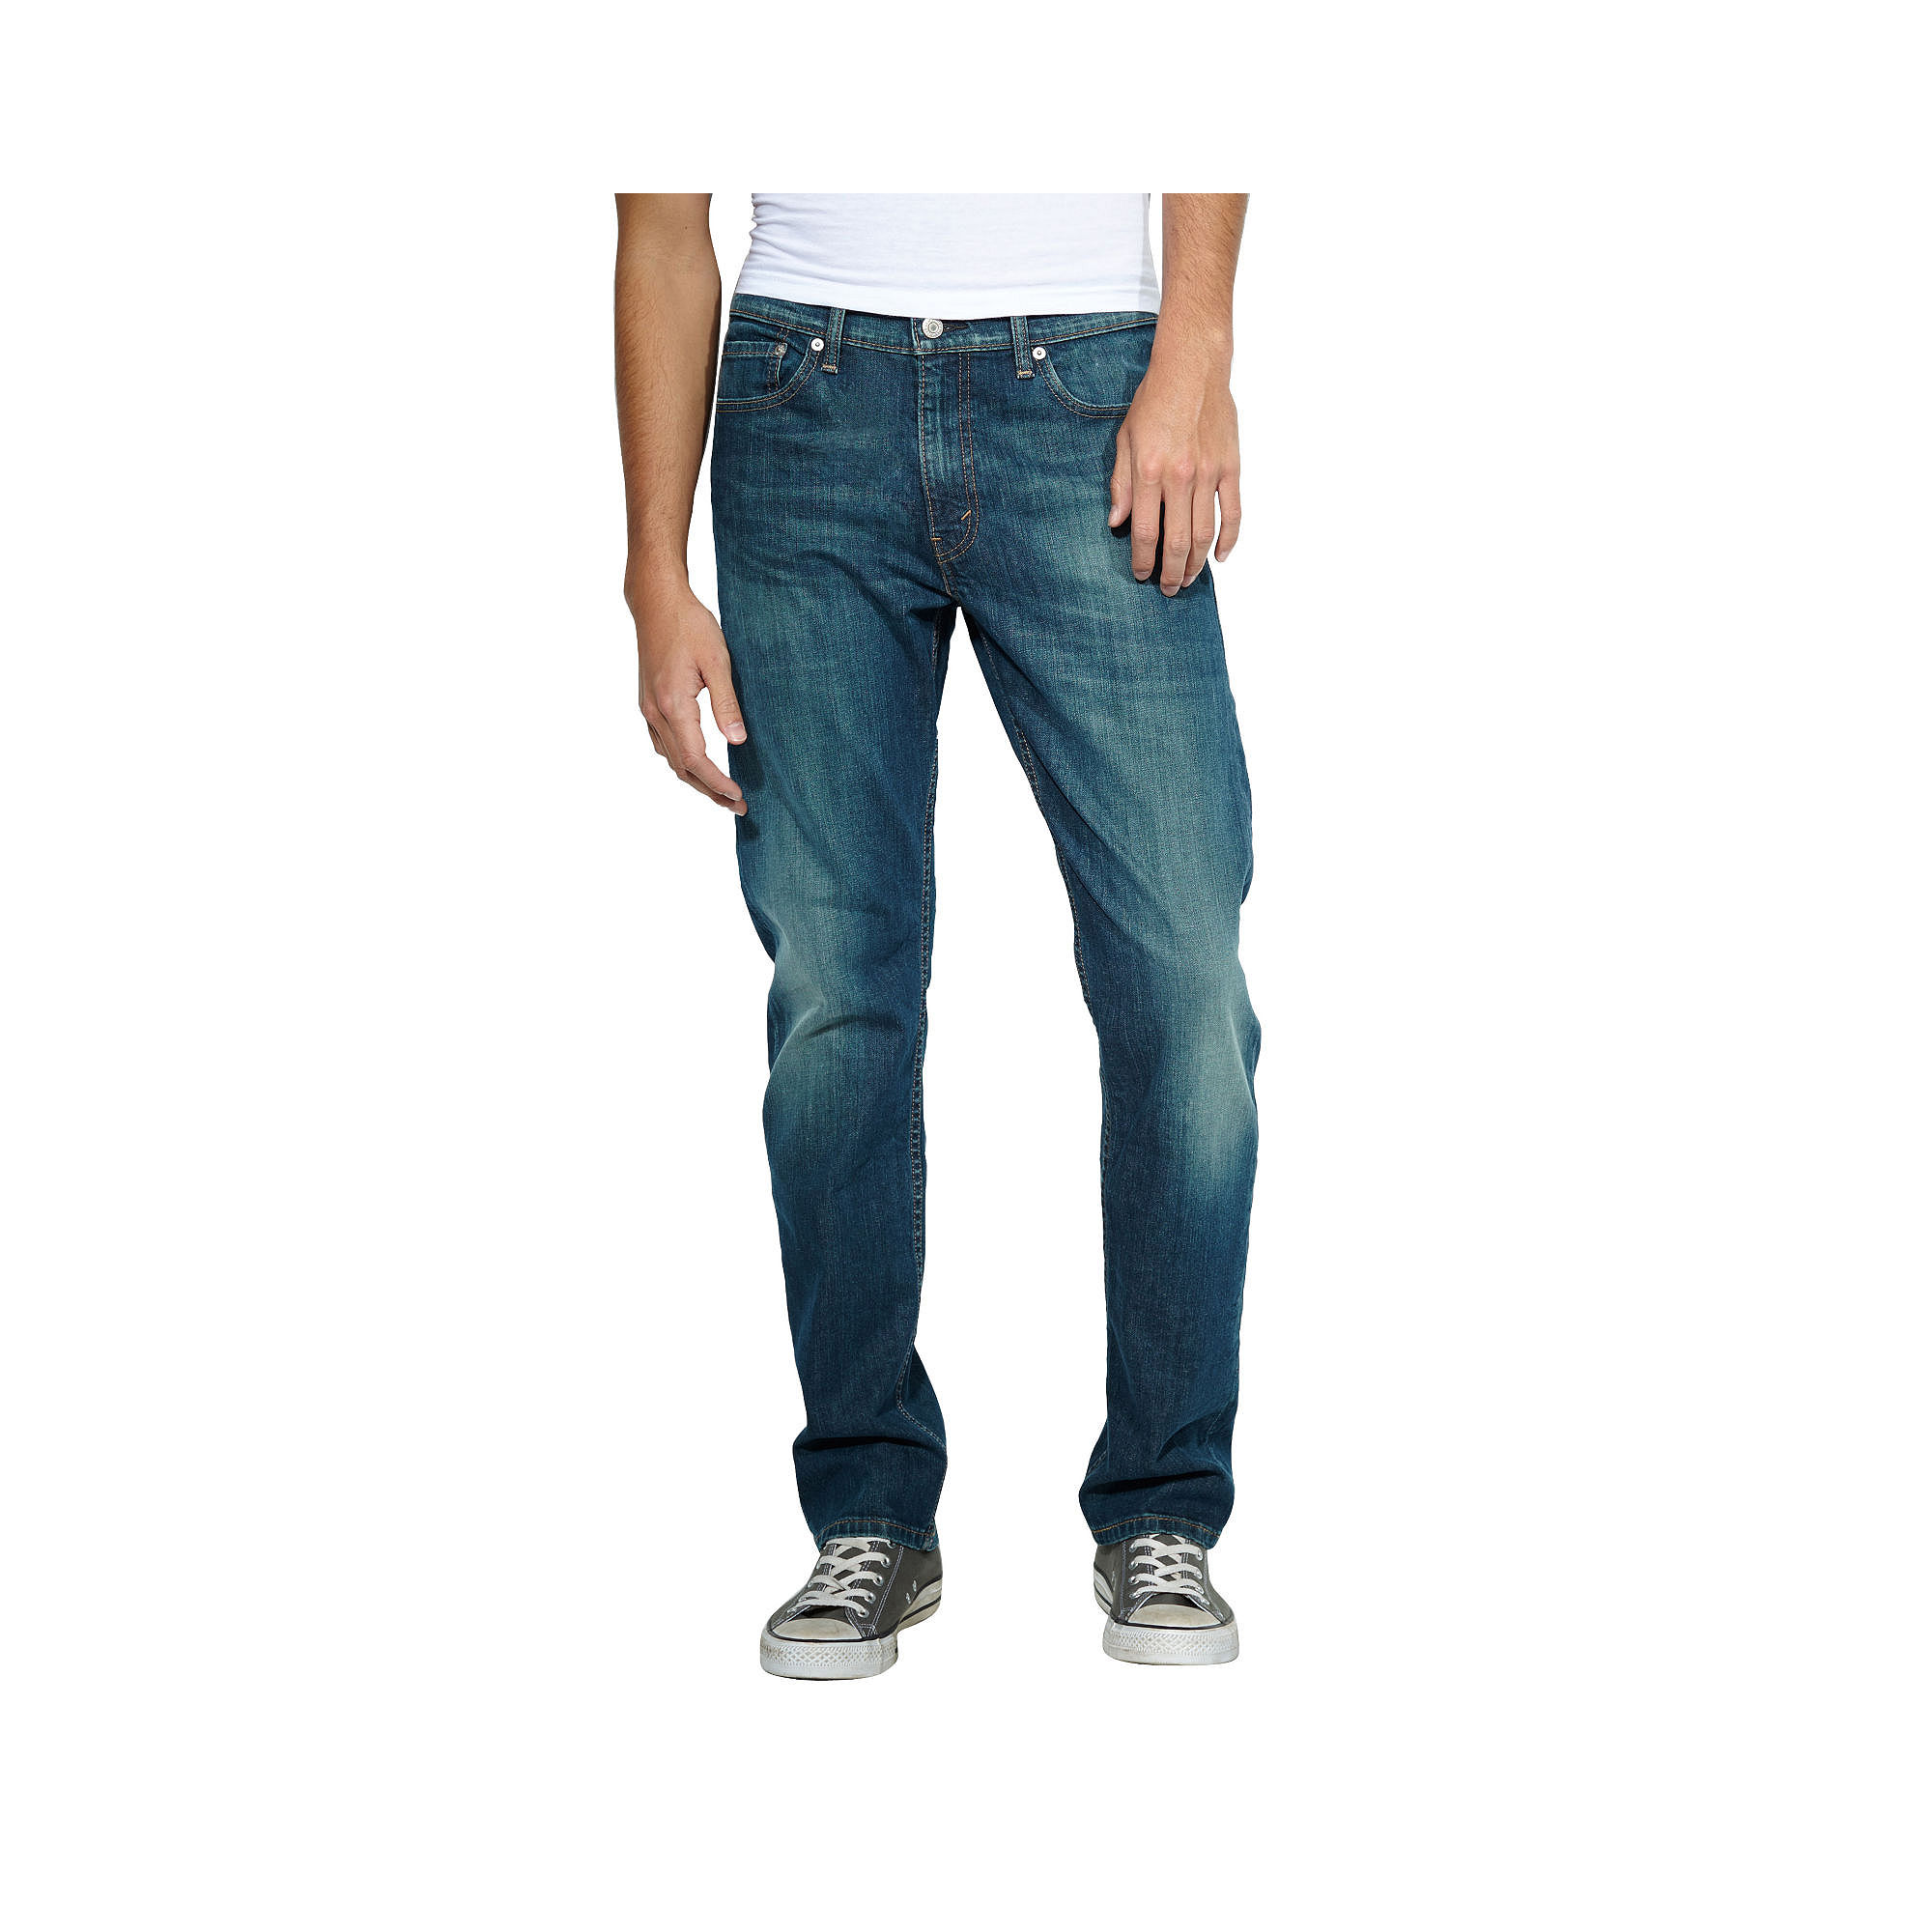 "Levi's 513"" Slim Straight Jeans"